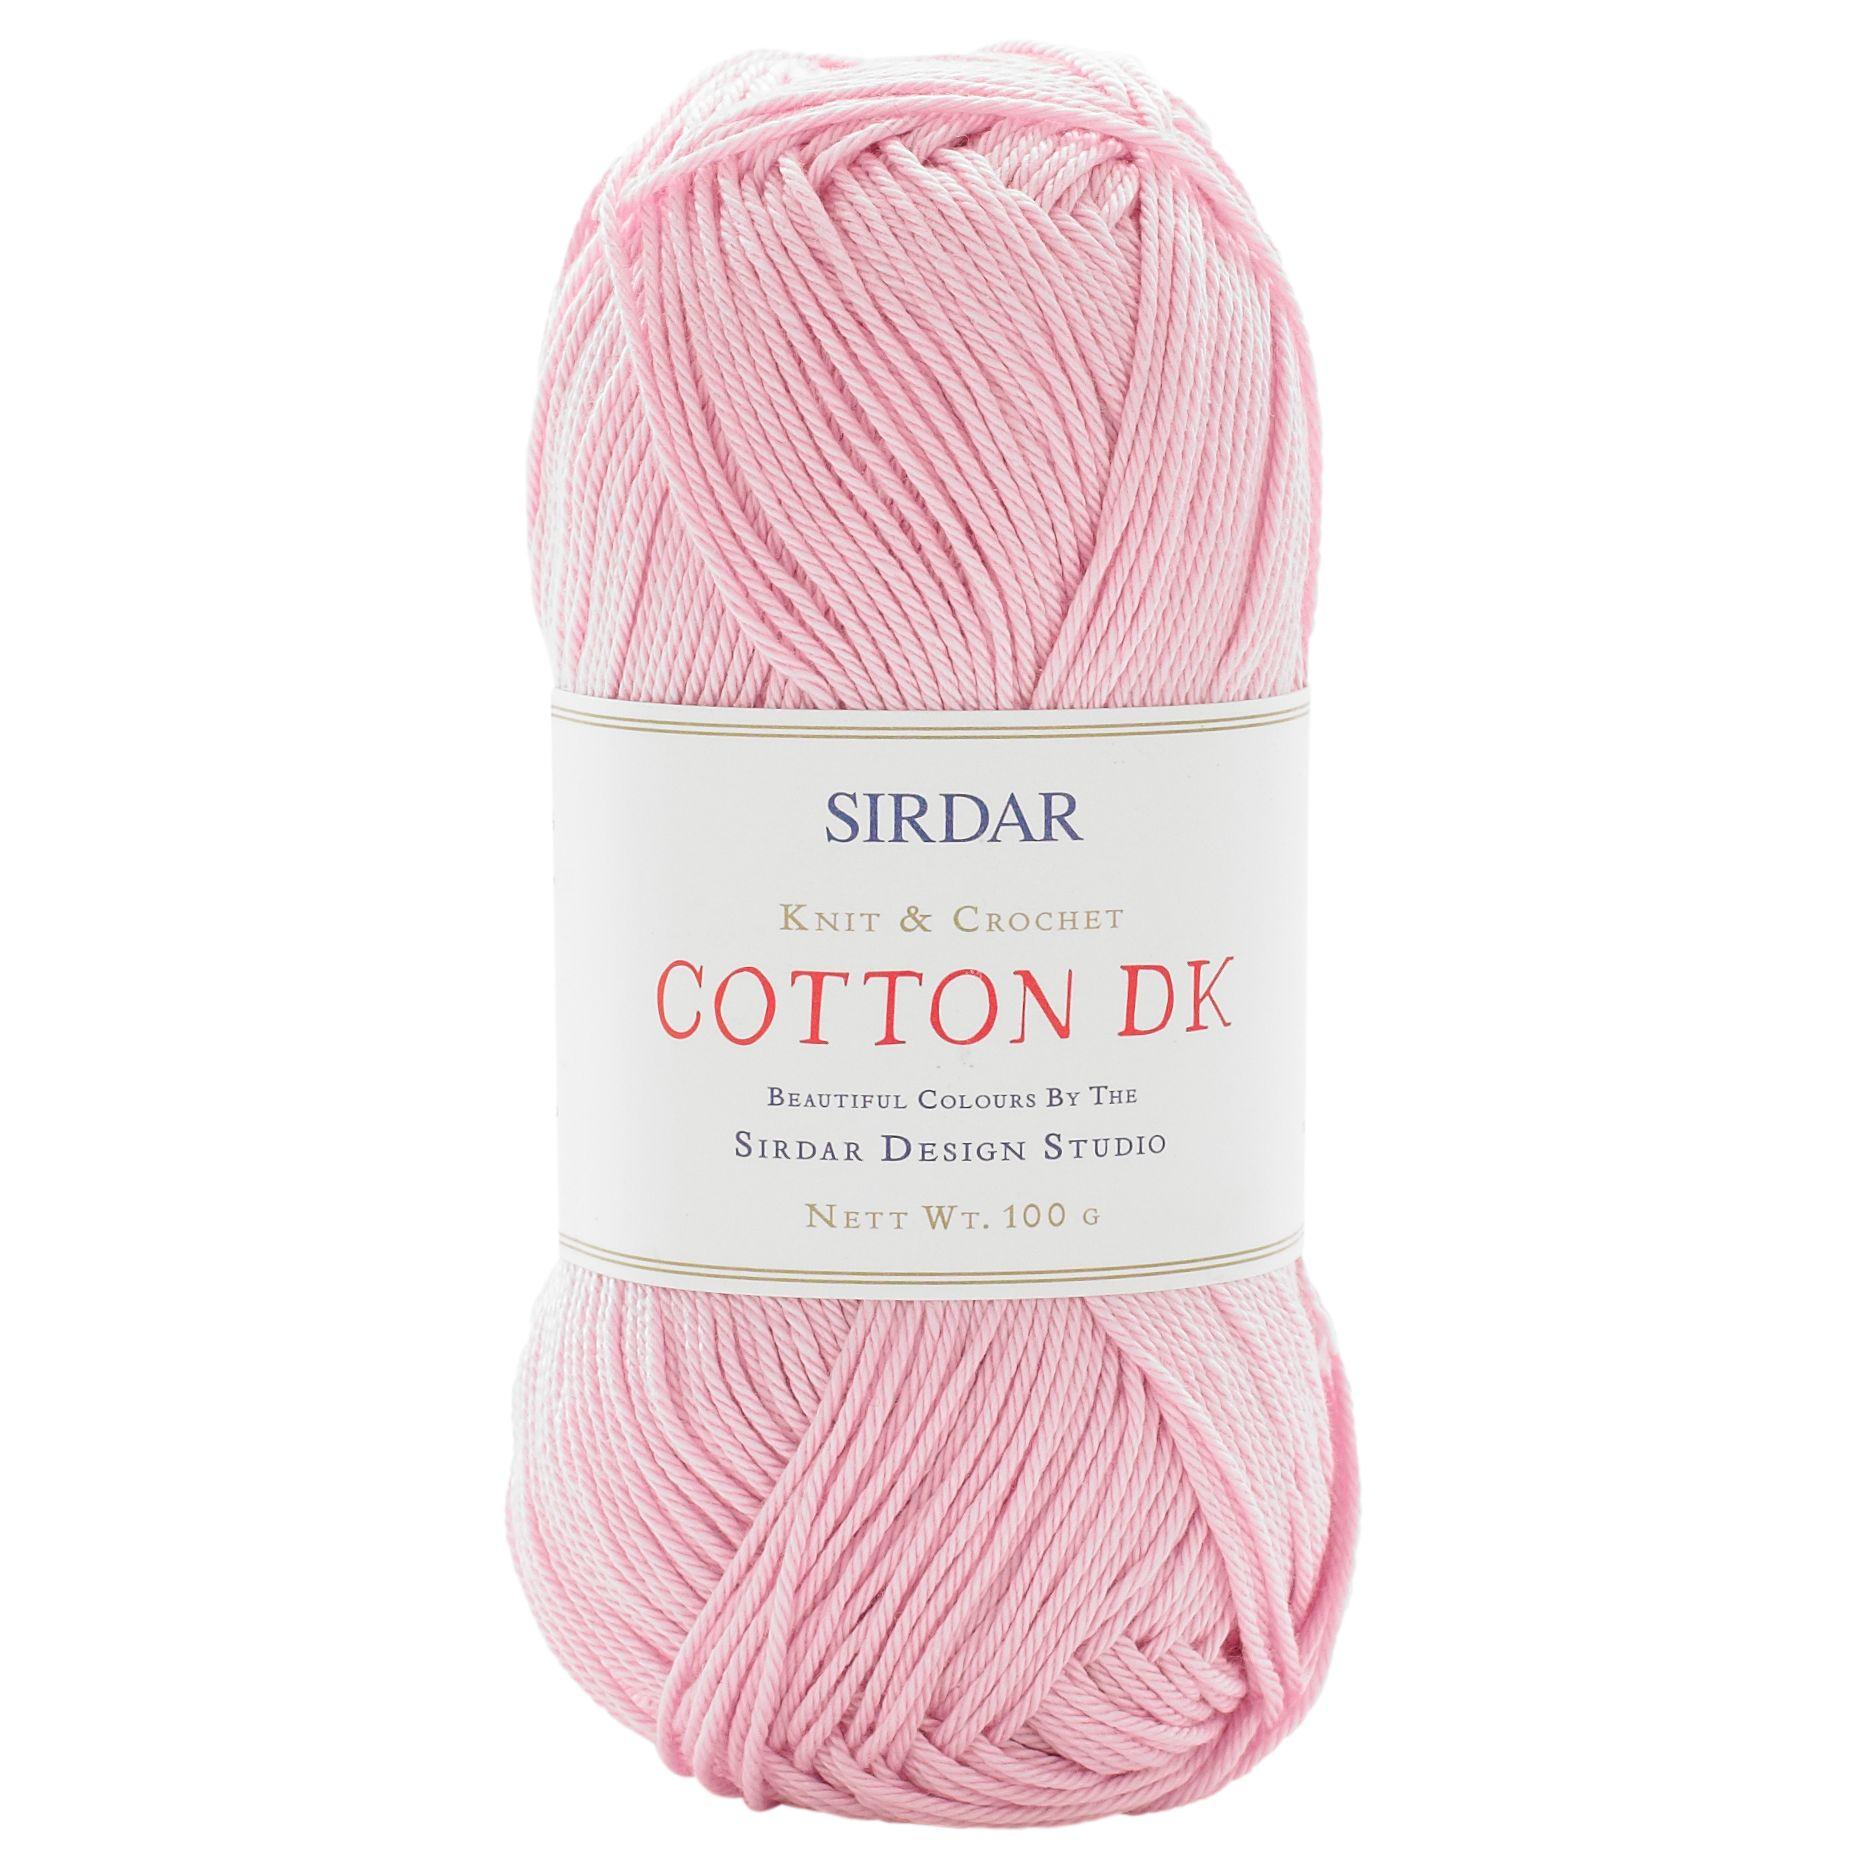 Sirdar Sirdar Cotton DK Yarn, 100g